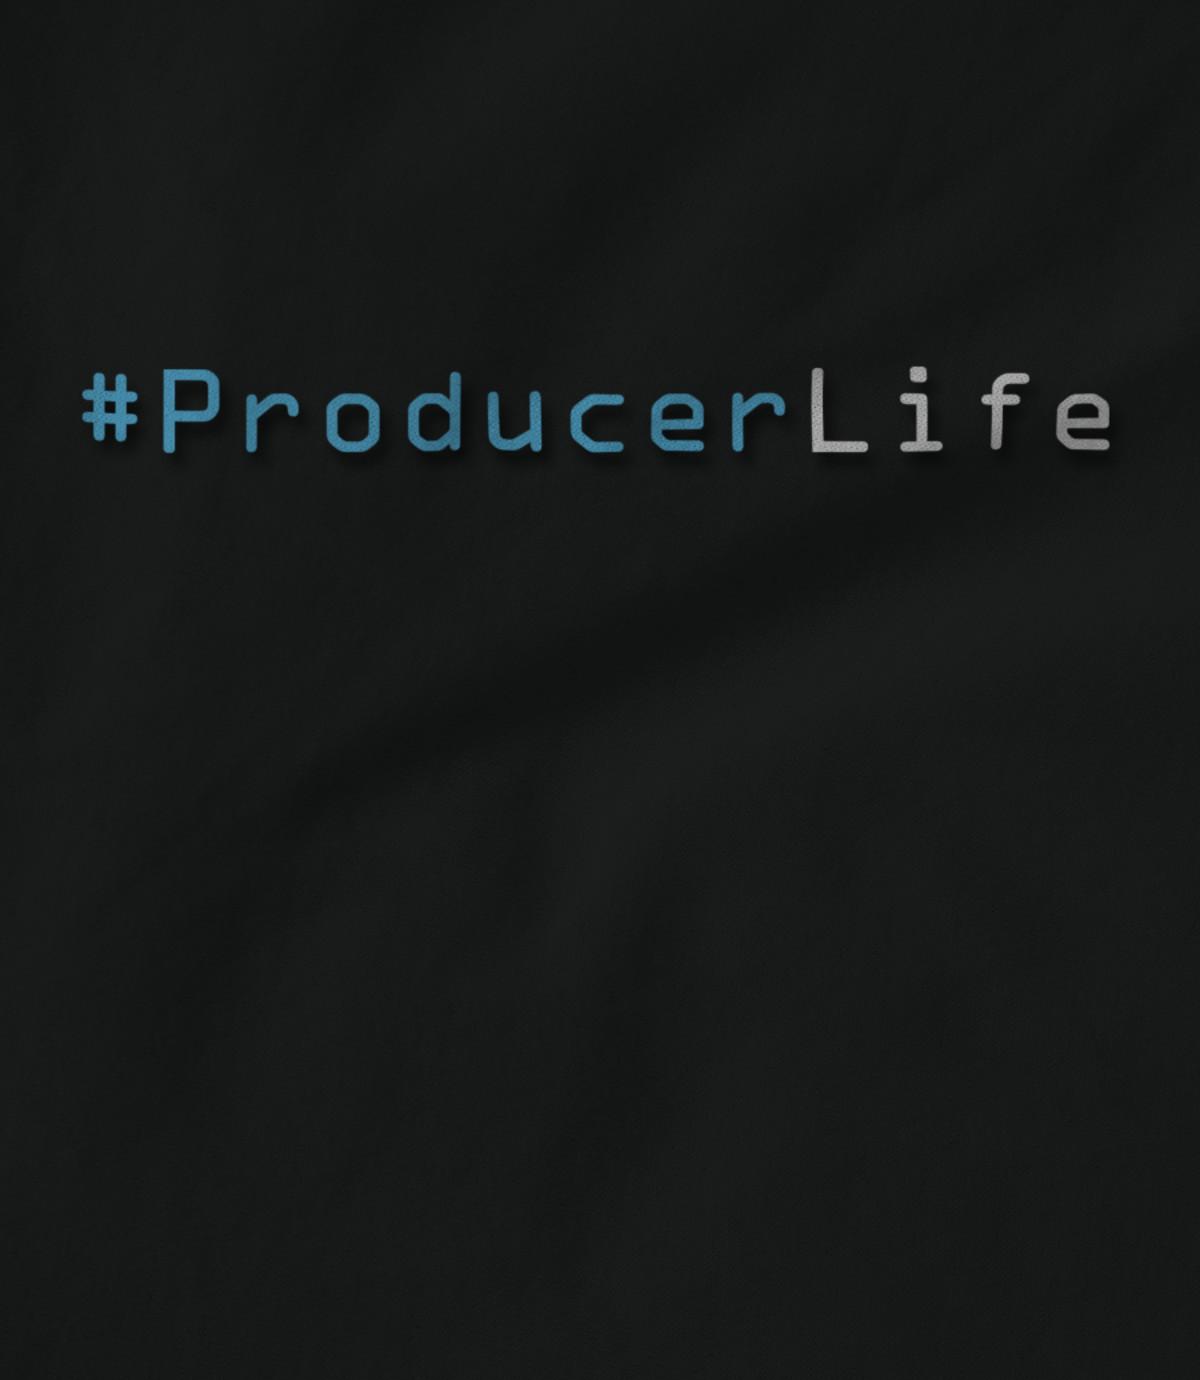 Tmsd  producerlife 1 1543861848